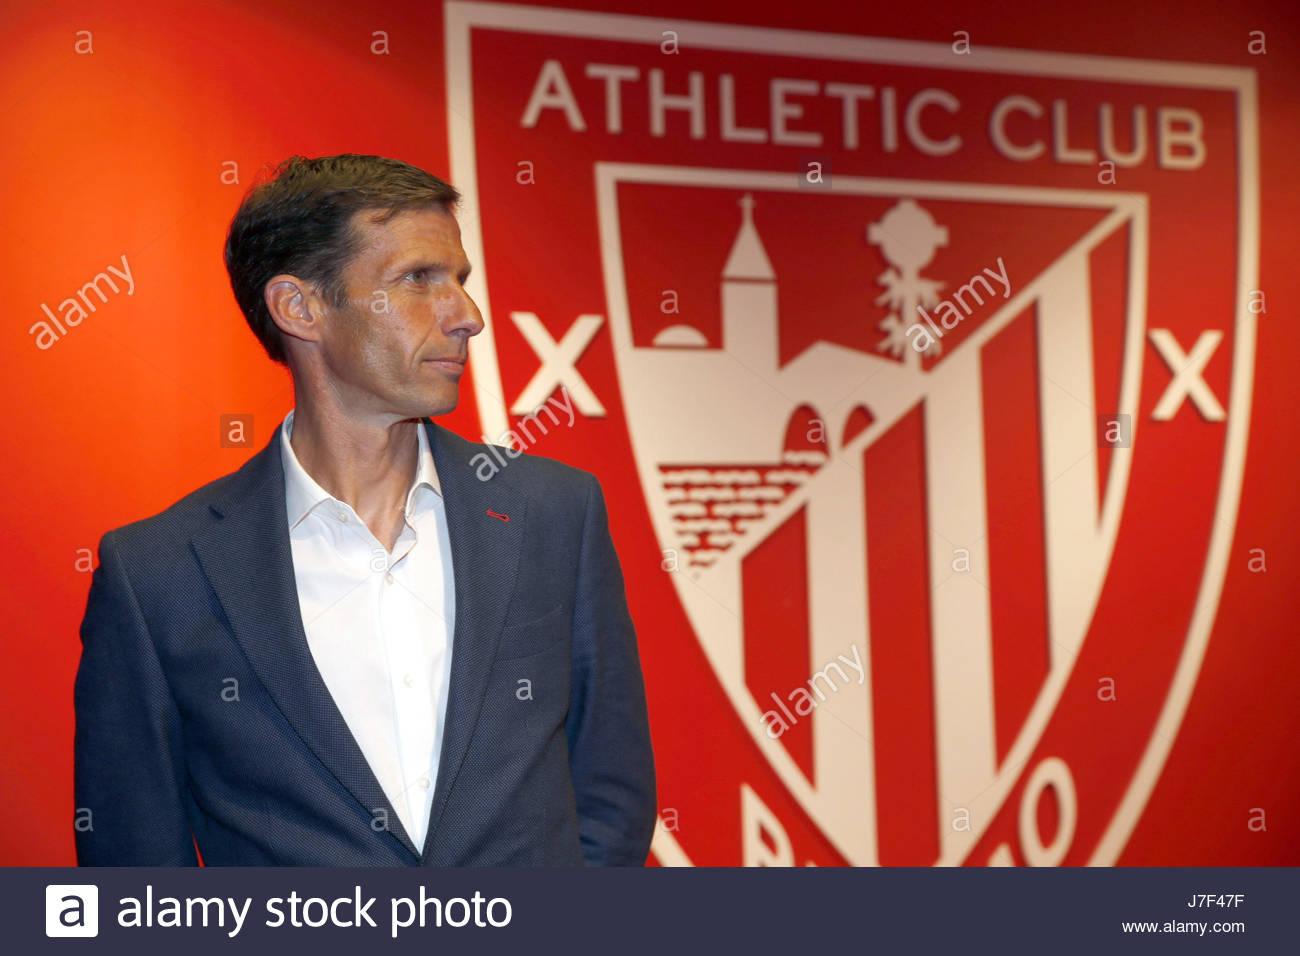 athletic-bilbaos-new-head-coach-jose-angel-aka-cuco-ziganda-poses-J7F47F